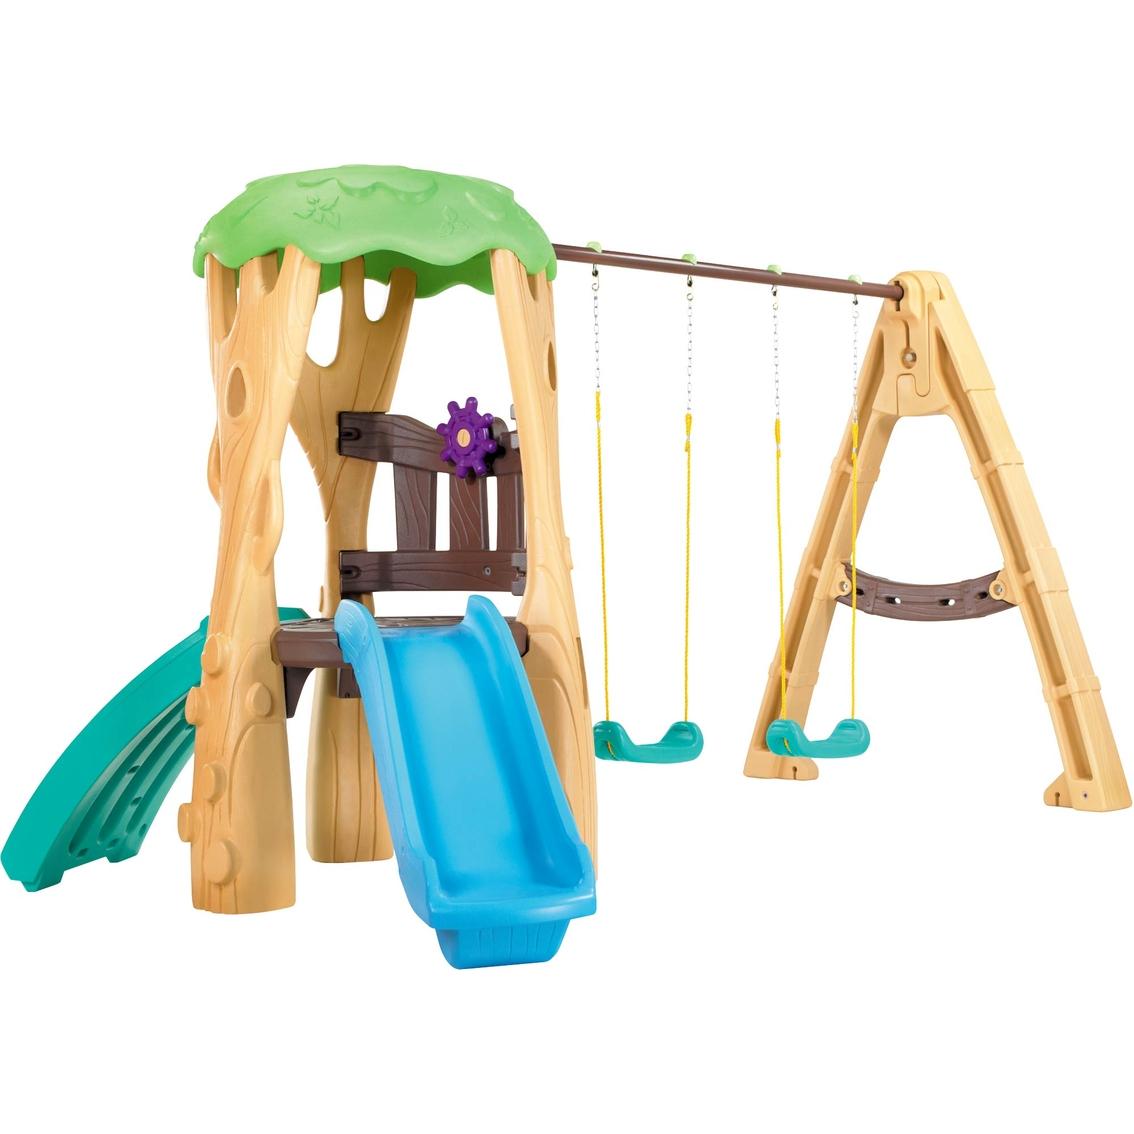 Little Tikes Tree House Swing Set Swingsets Slides Climbers